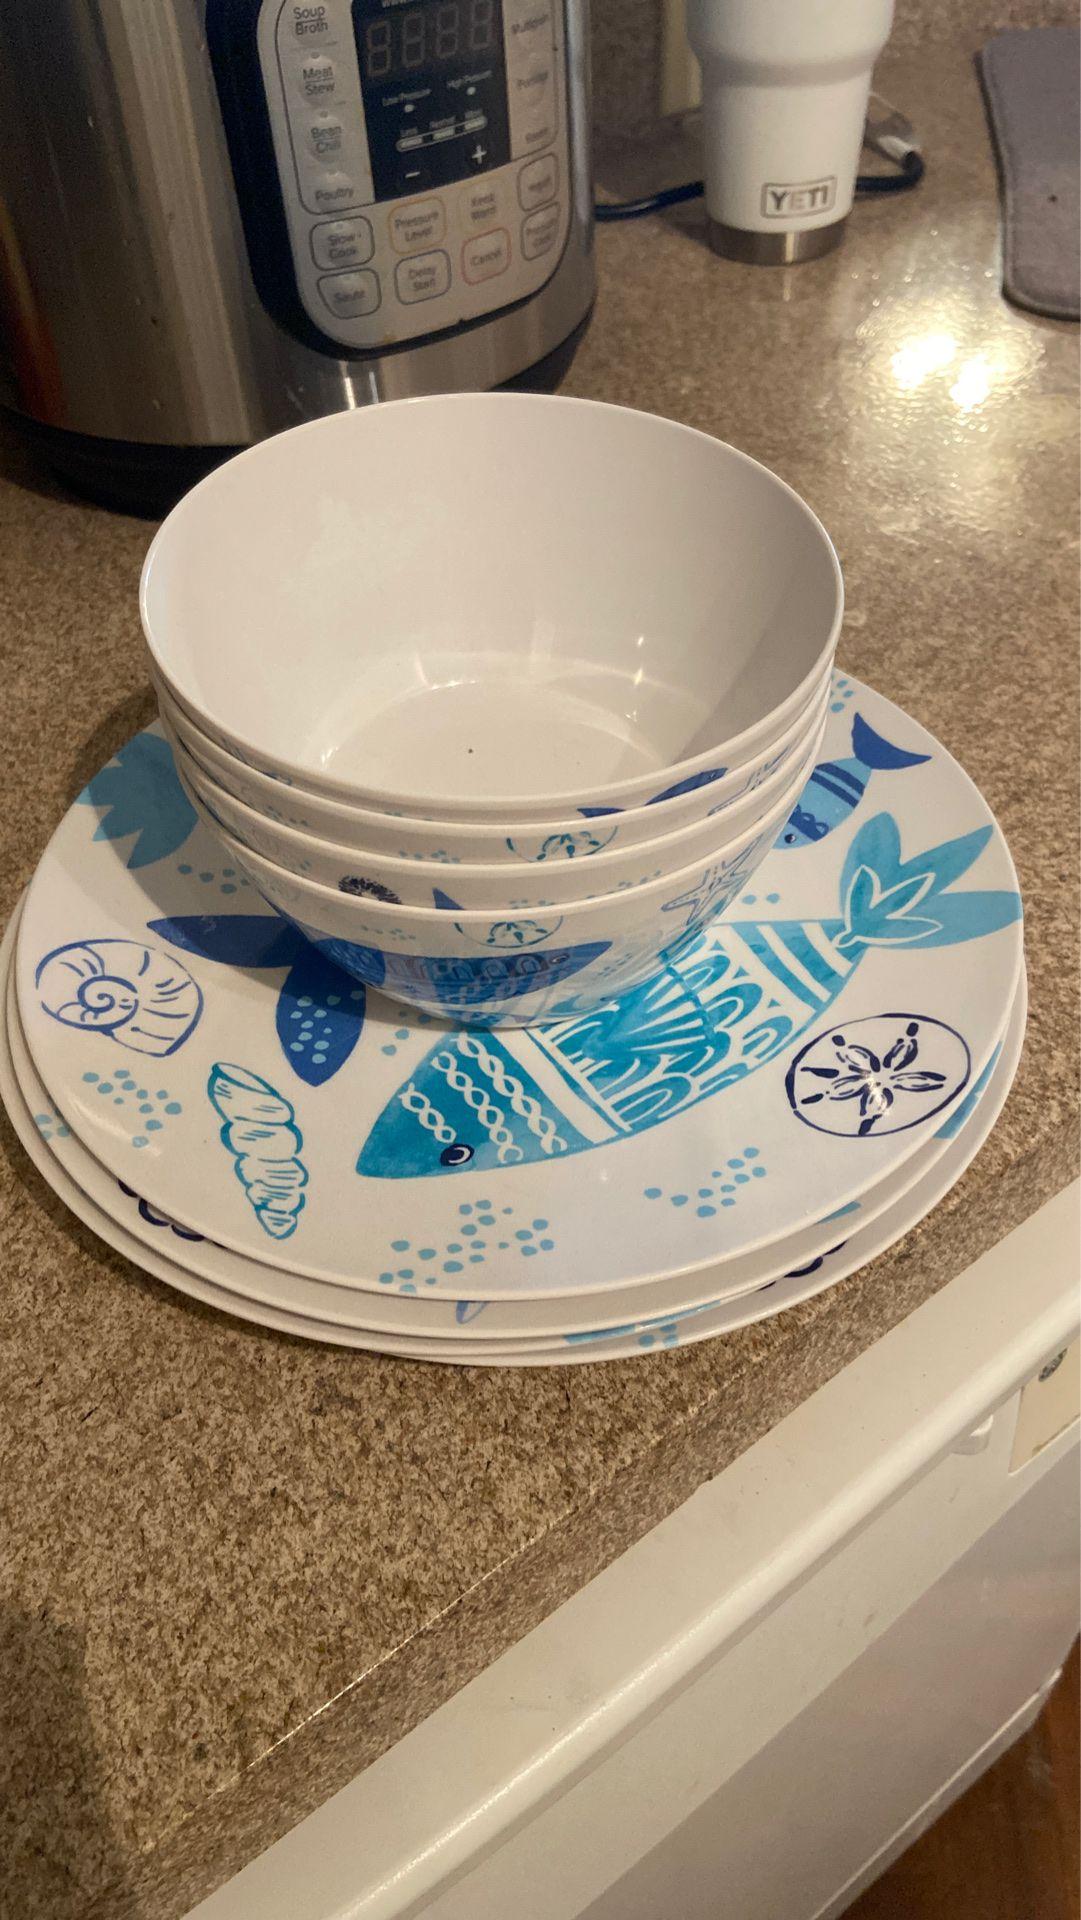 Light Blue Fish Design Plates and Bowls